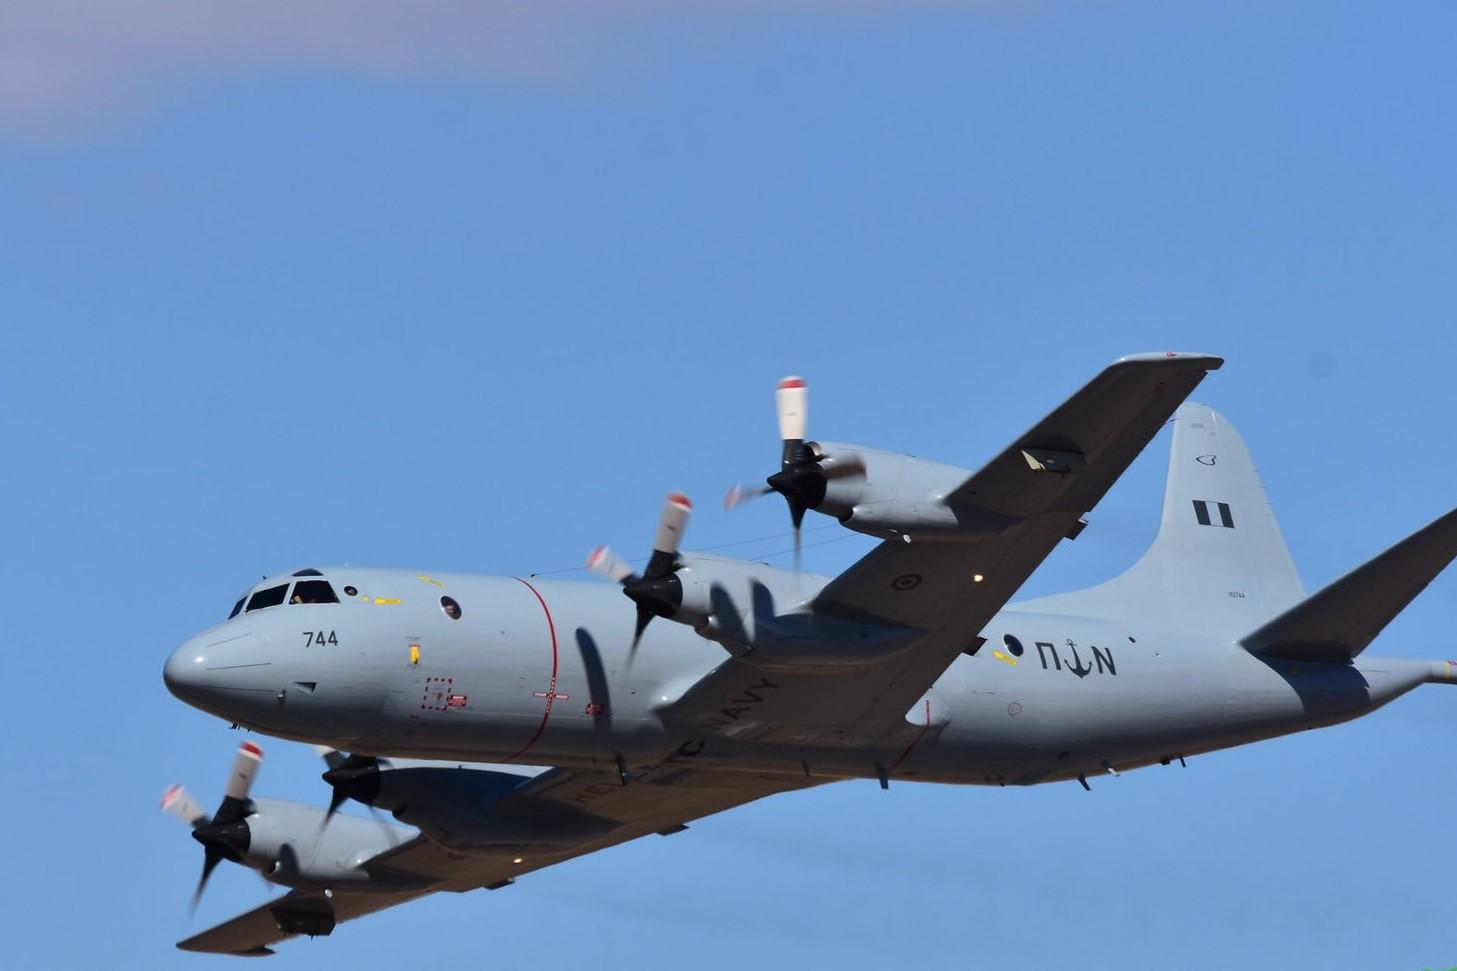 Photo of Σε αδιέξοδο το Πολεμικό Ναυτικό με το πρόγραμμα αναβάθμισης των Ρ-3Β